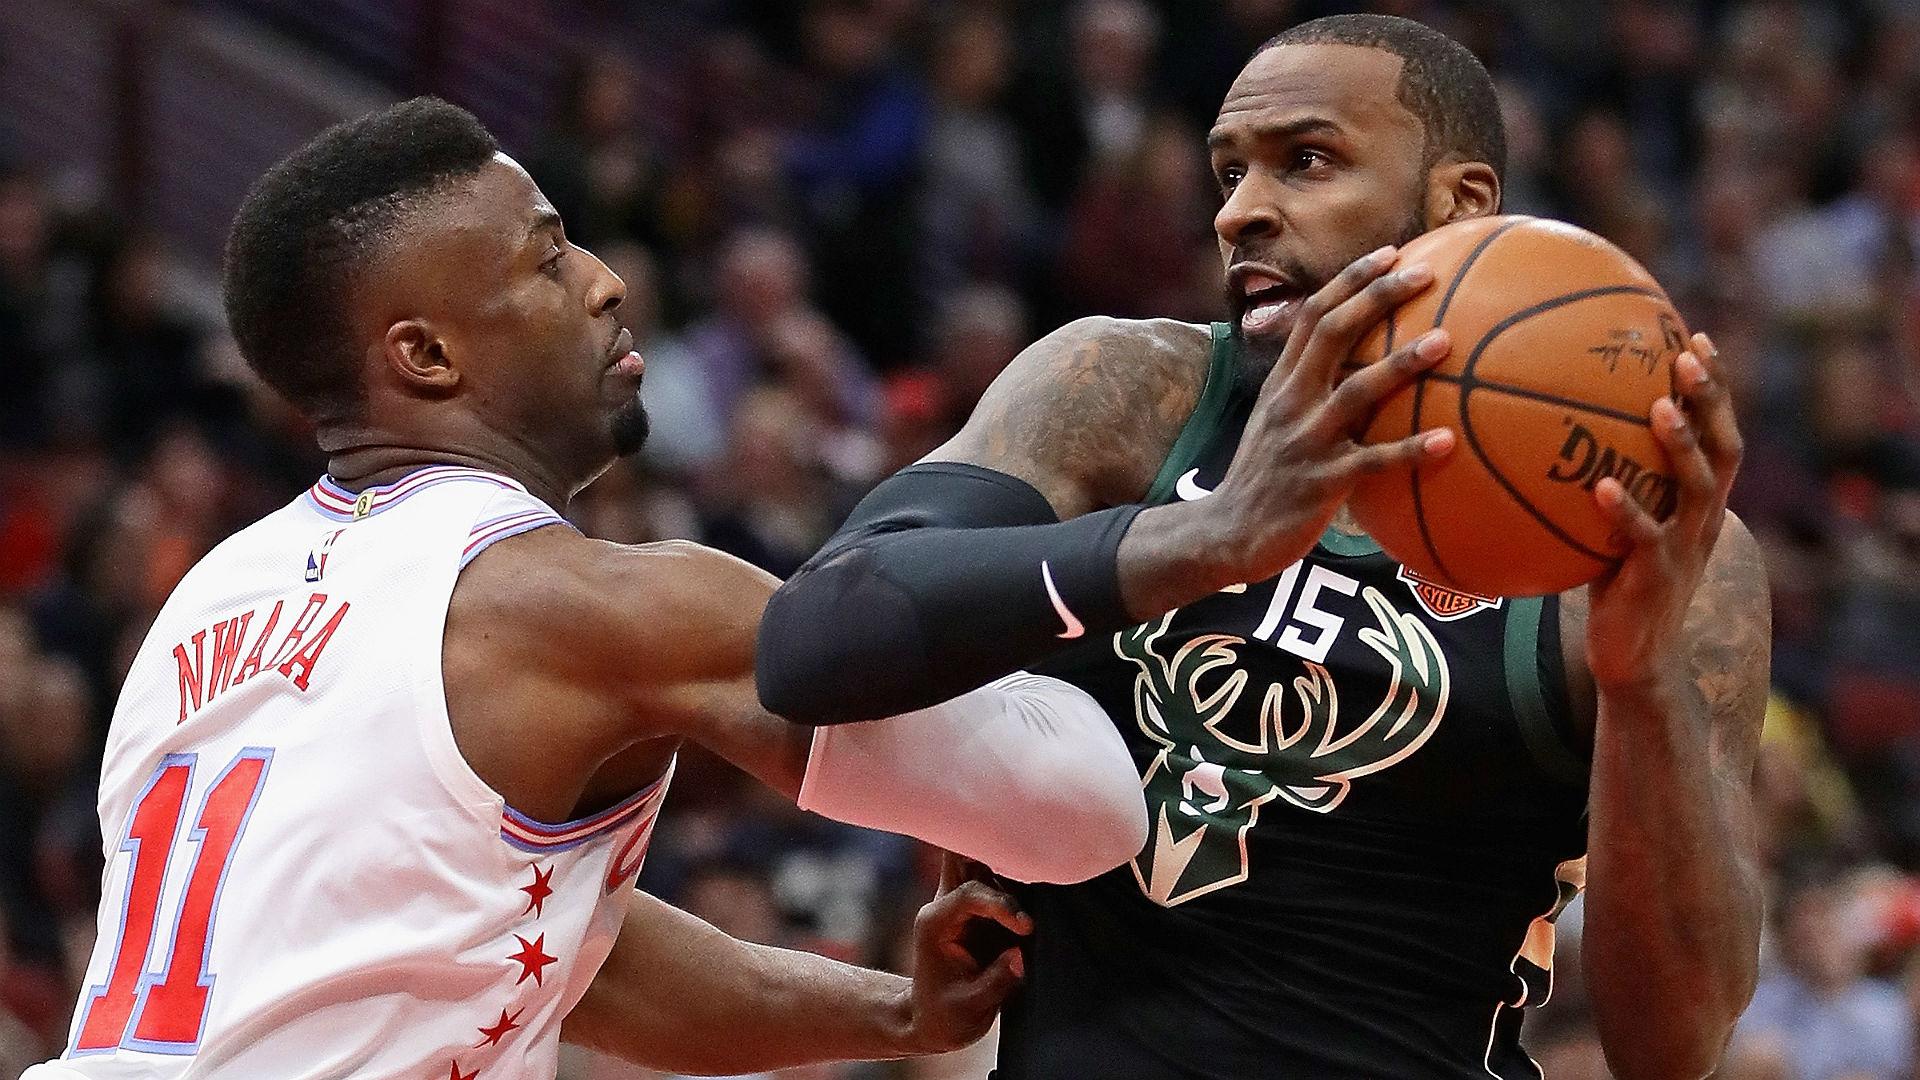 NBA free agency rumors: Bucks bringing back Shabazz Muhammad